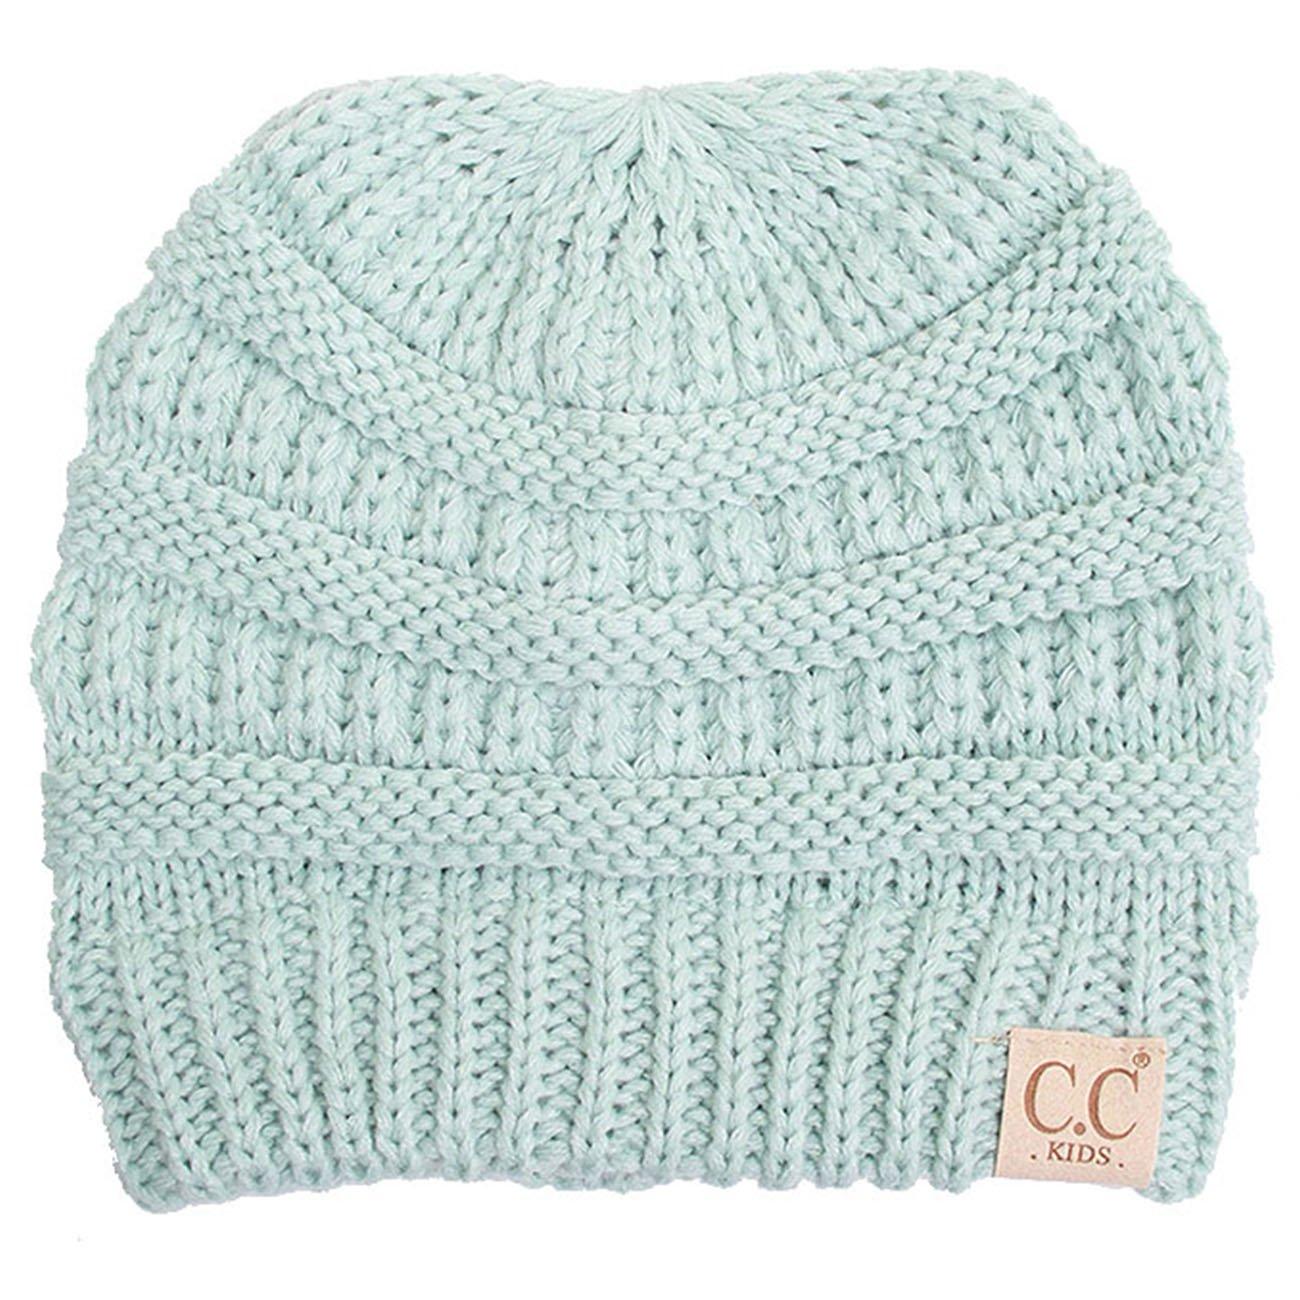 ScarvesMe Toddler Children Kids Girl Boy Ribbed Knit Winter Hat Beanie hat Cap Ages 2-7